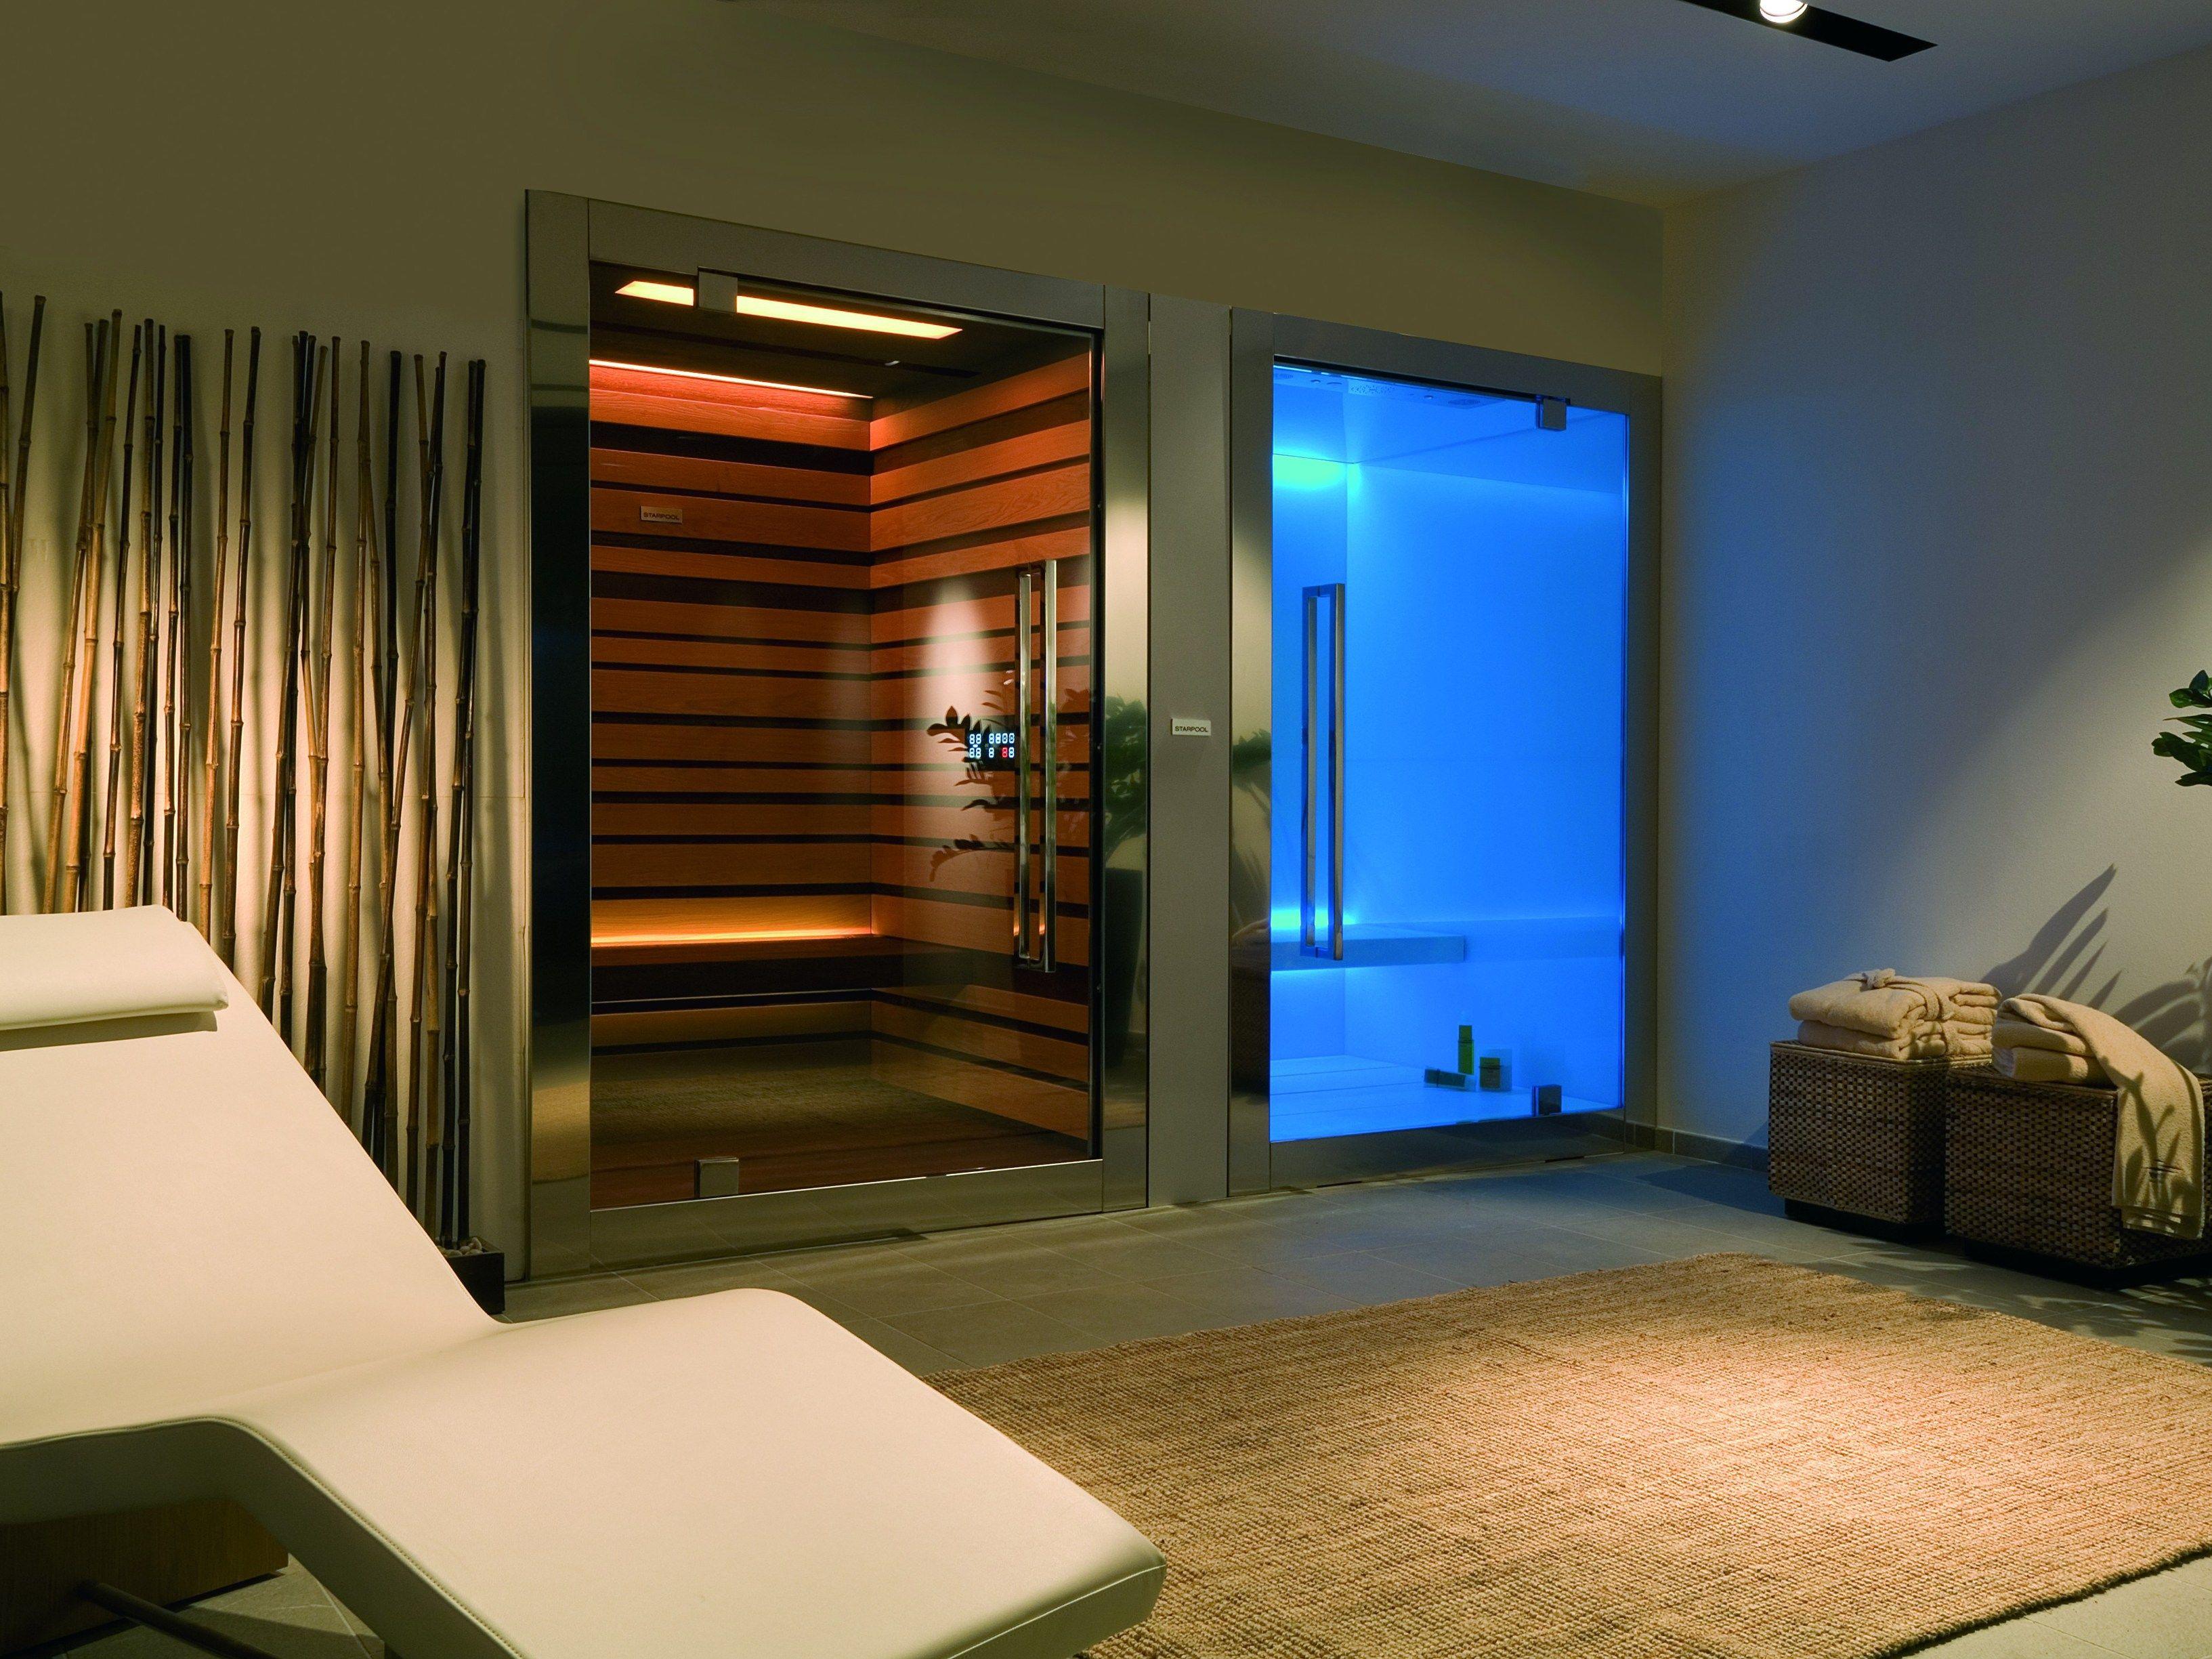 prix hammam beautiful cabine sauna pas cher ouvrir un hammam prix with prix hammam dfdccdbfd. Black Bedroom Furniture Sets. Home Design Ideas